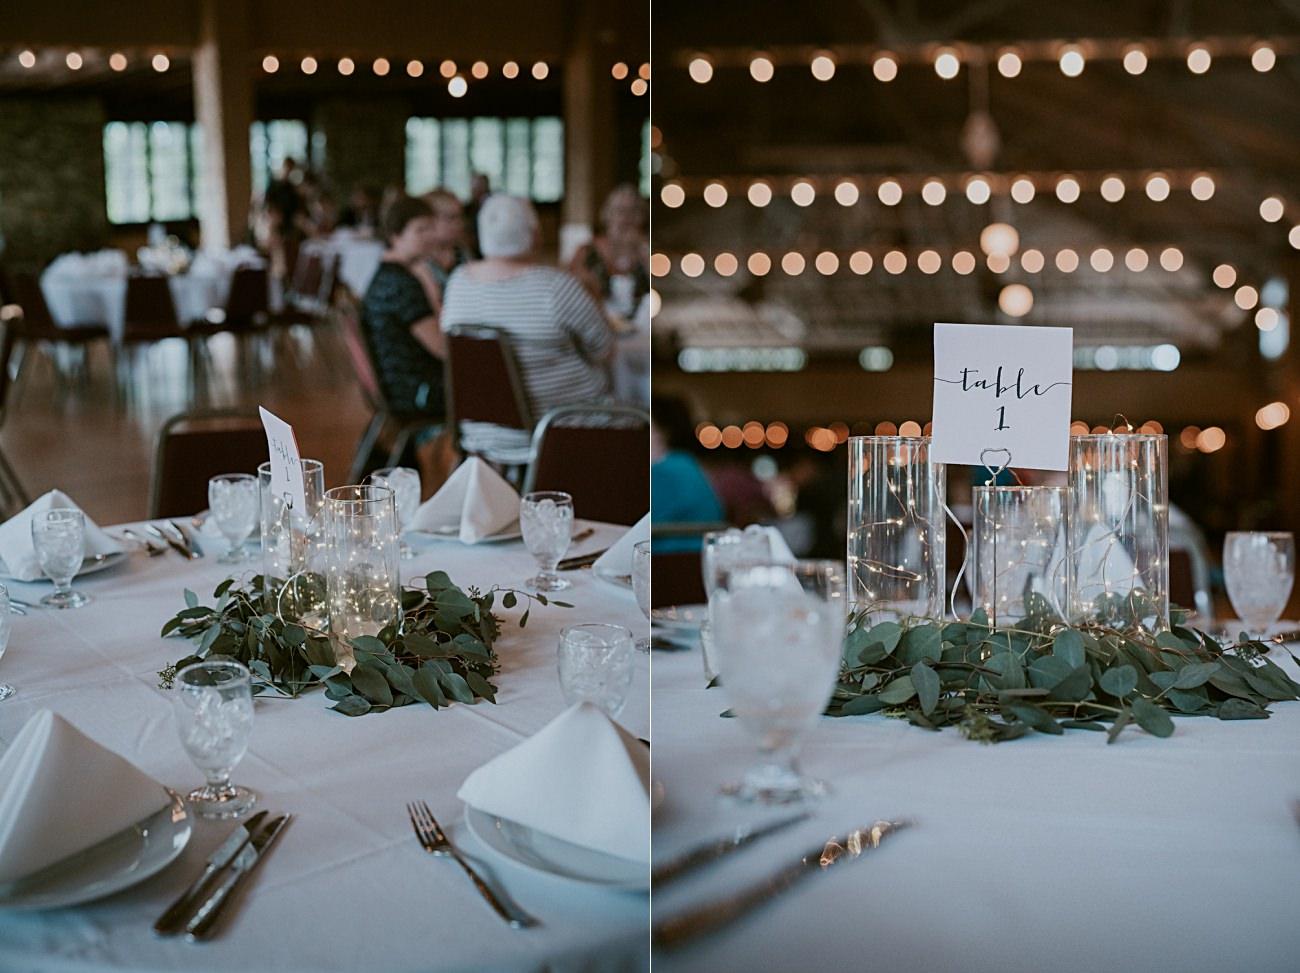 Rothschild Pavillion Wedding Reception in Wausau Wisconsin, Mountaintop Wedding, Wedding Dress with sleeves, Rib Mountain Wedding in Wausau Wisconsin - Mountaintop Wedding, Wisconsin Wedding - Natural Intuition Photography